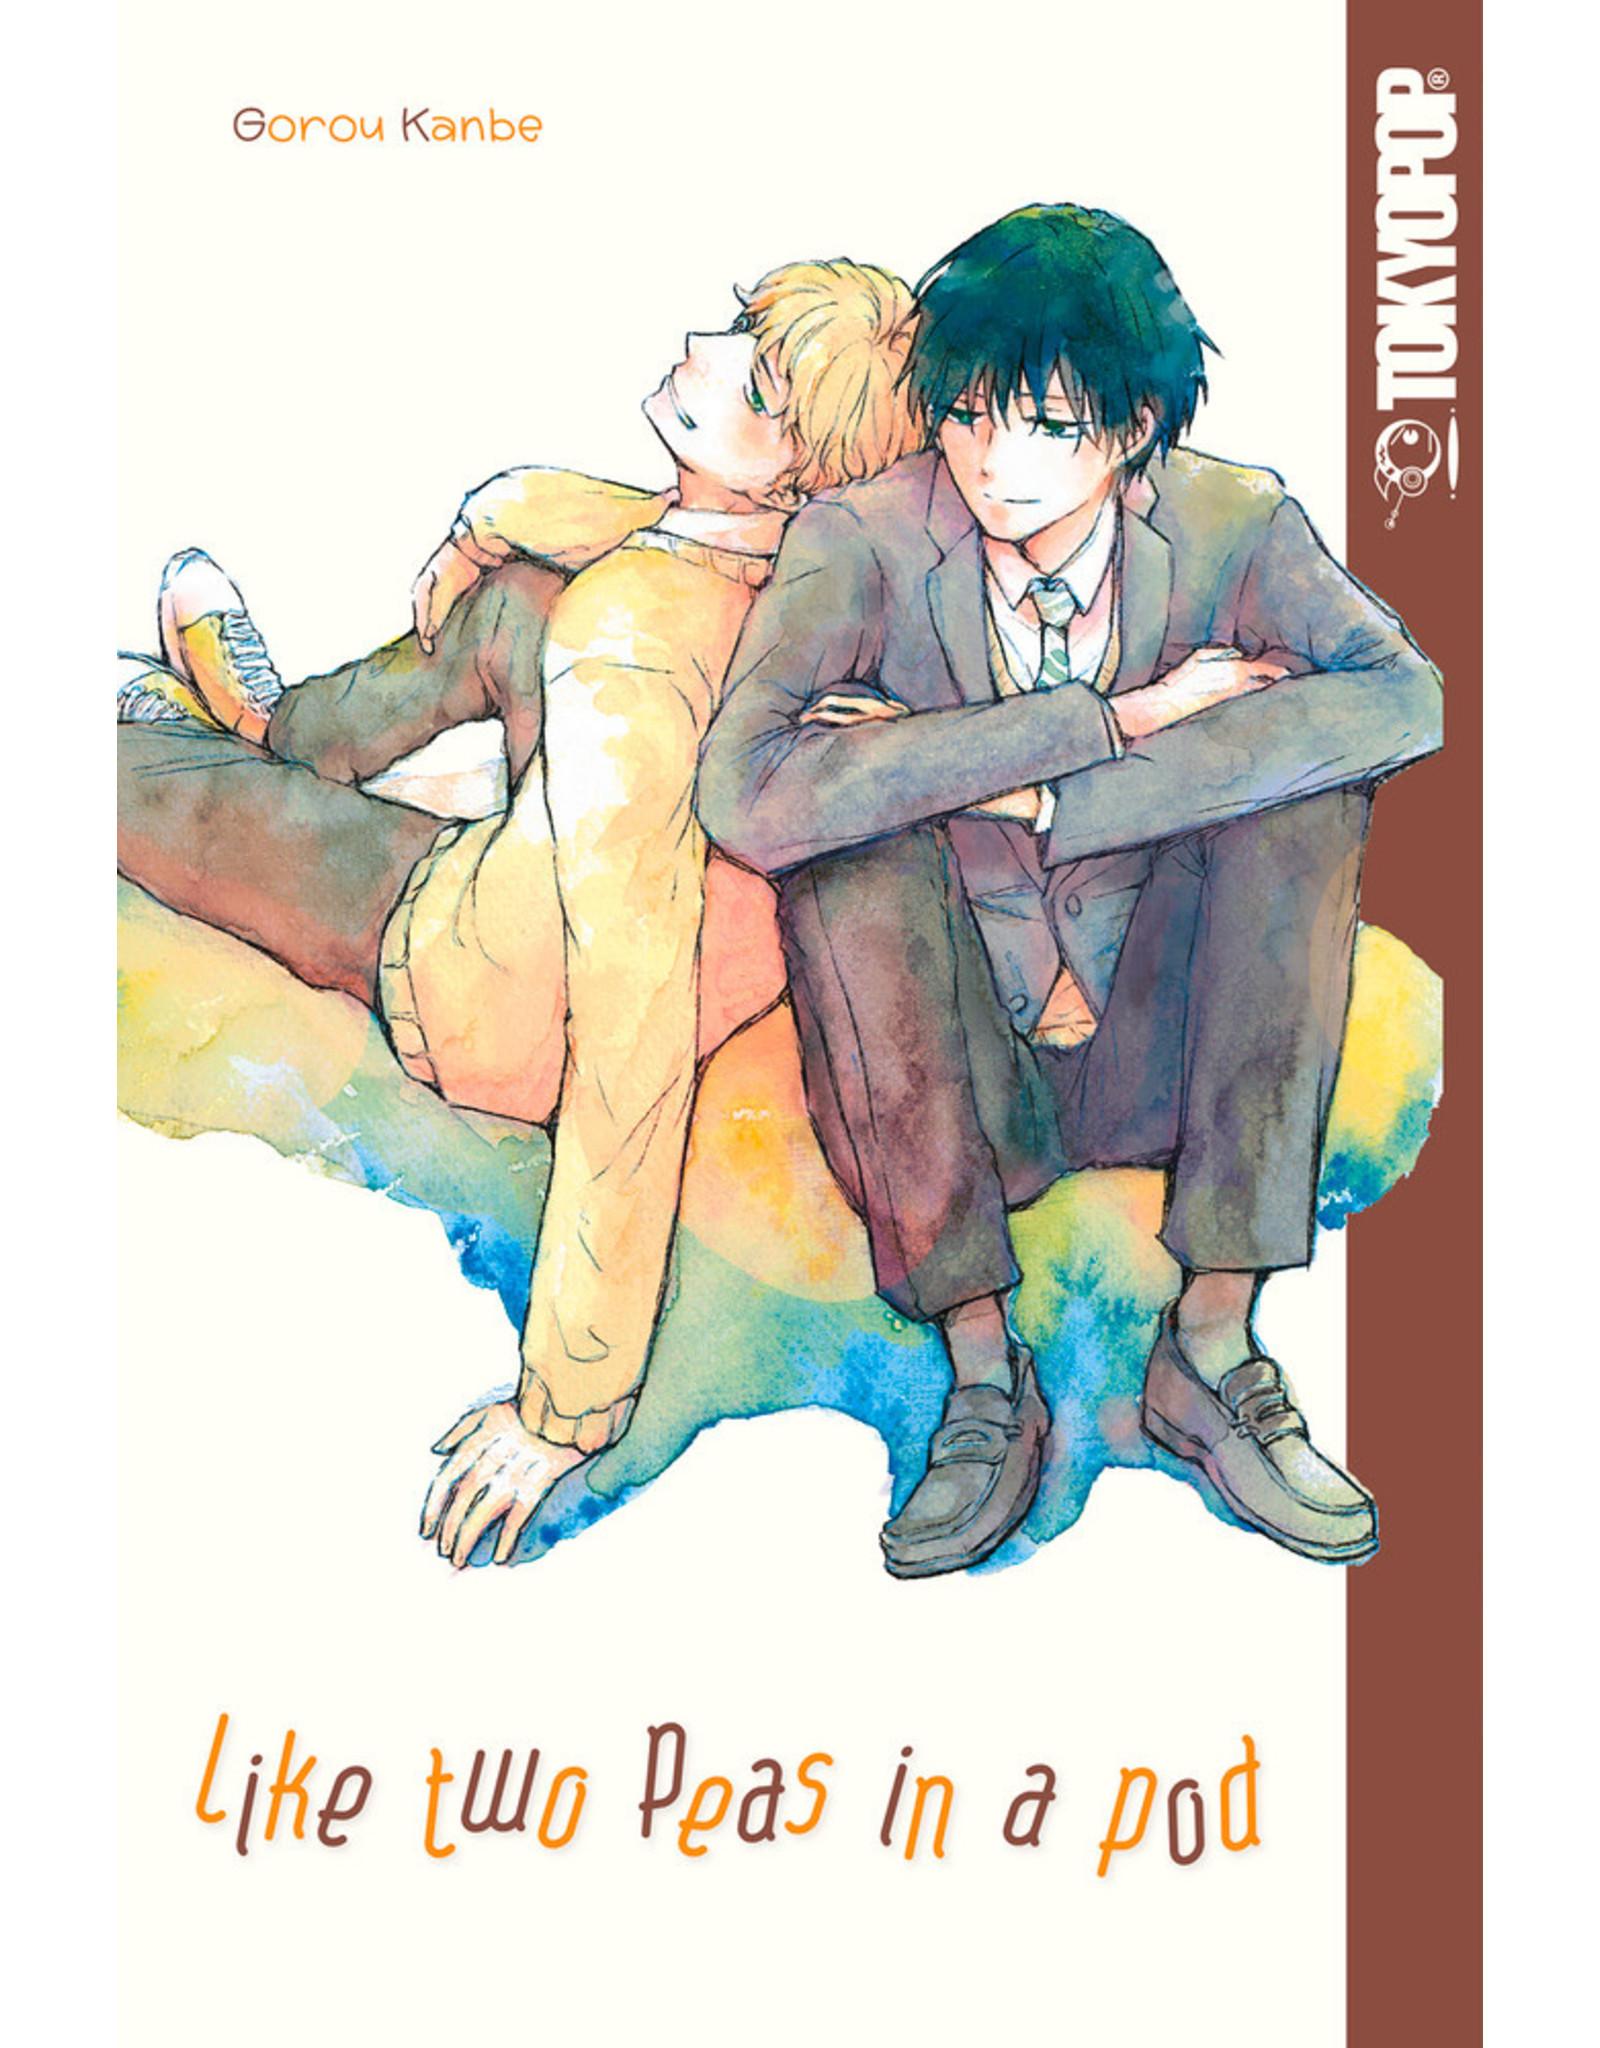 Like Two Peas in a Pod (English) - Manga